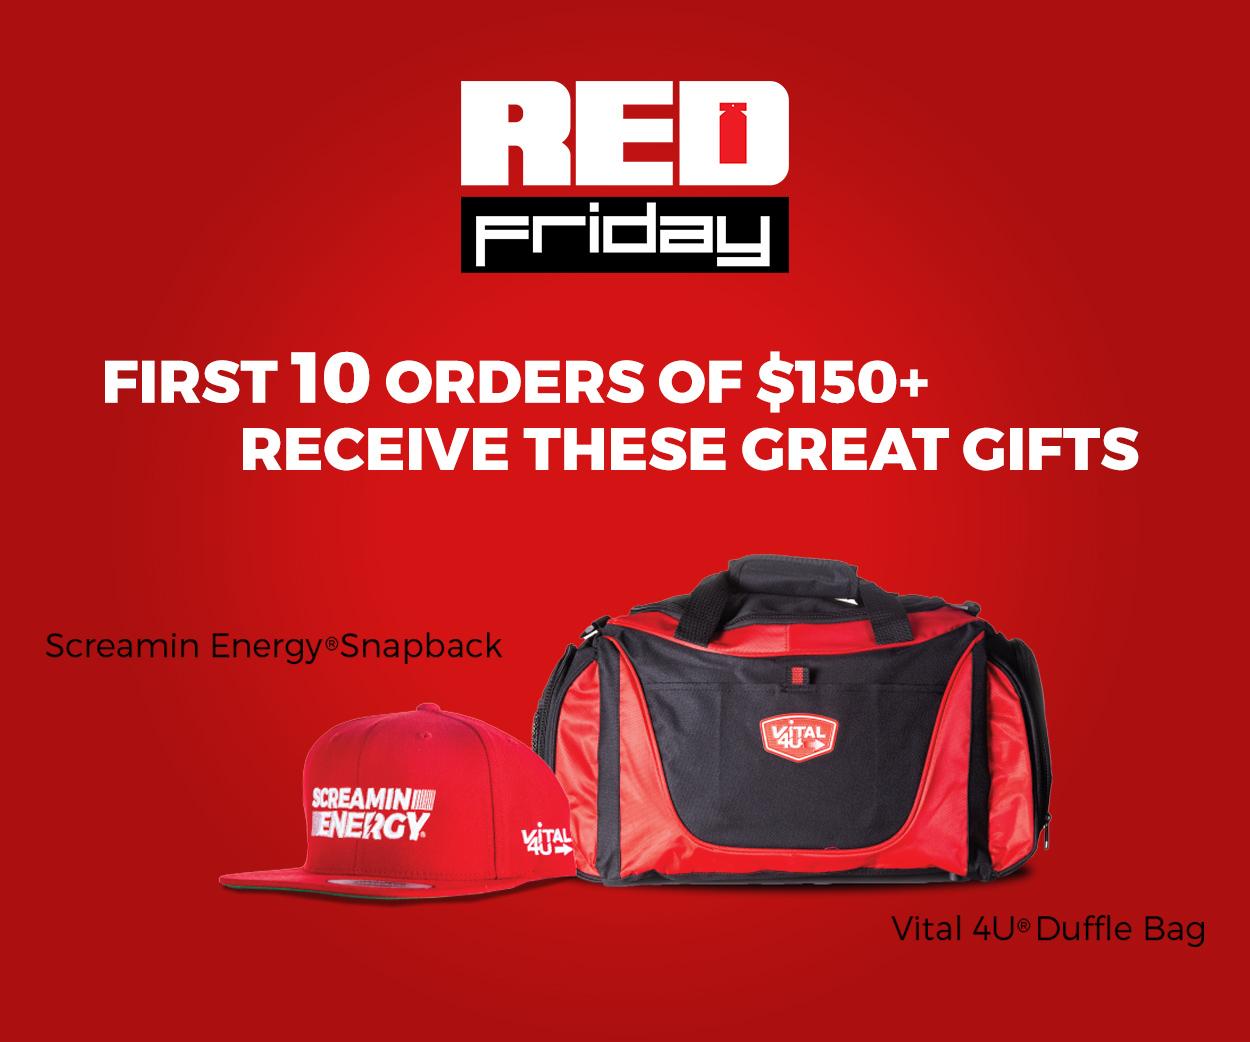 vital 4u red friday gift package